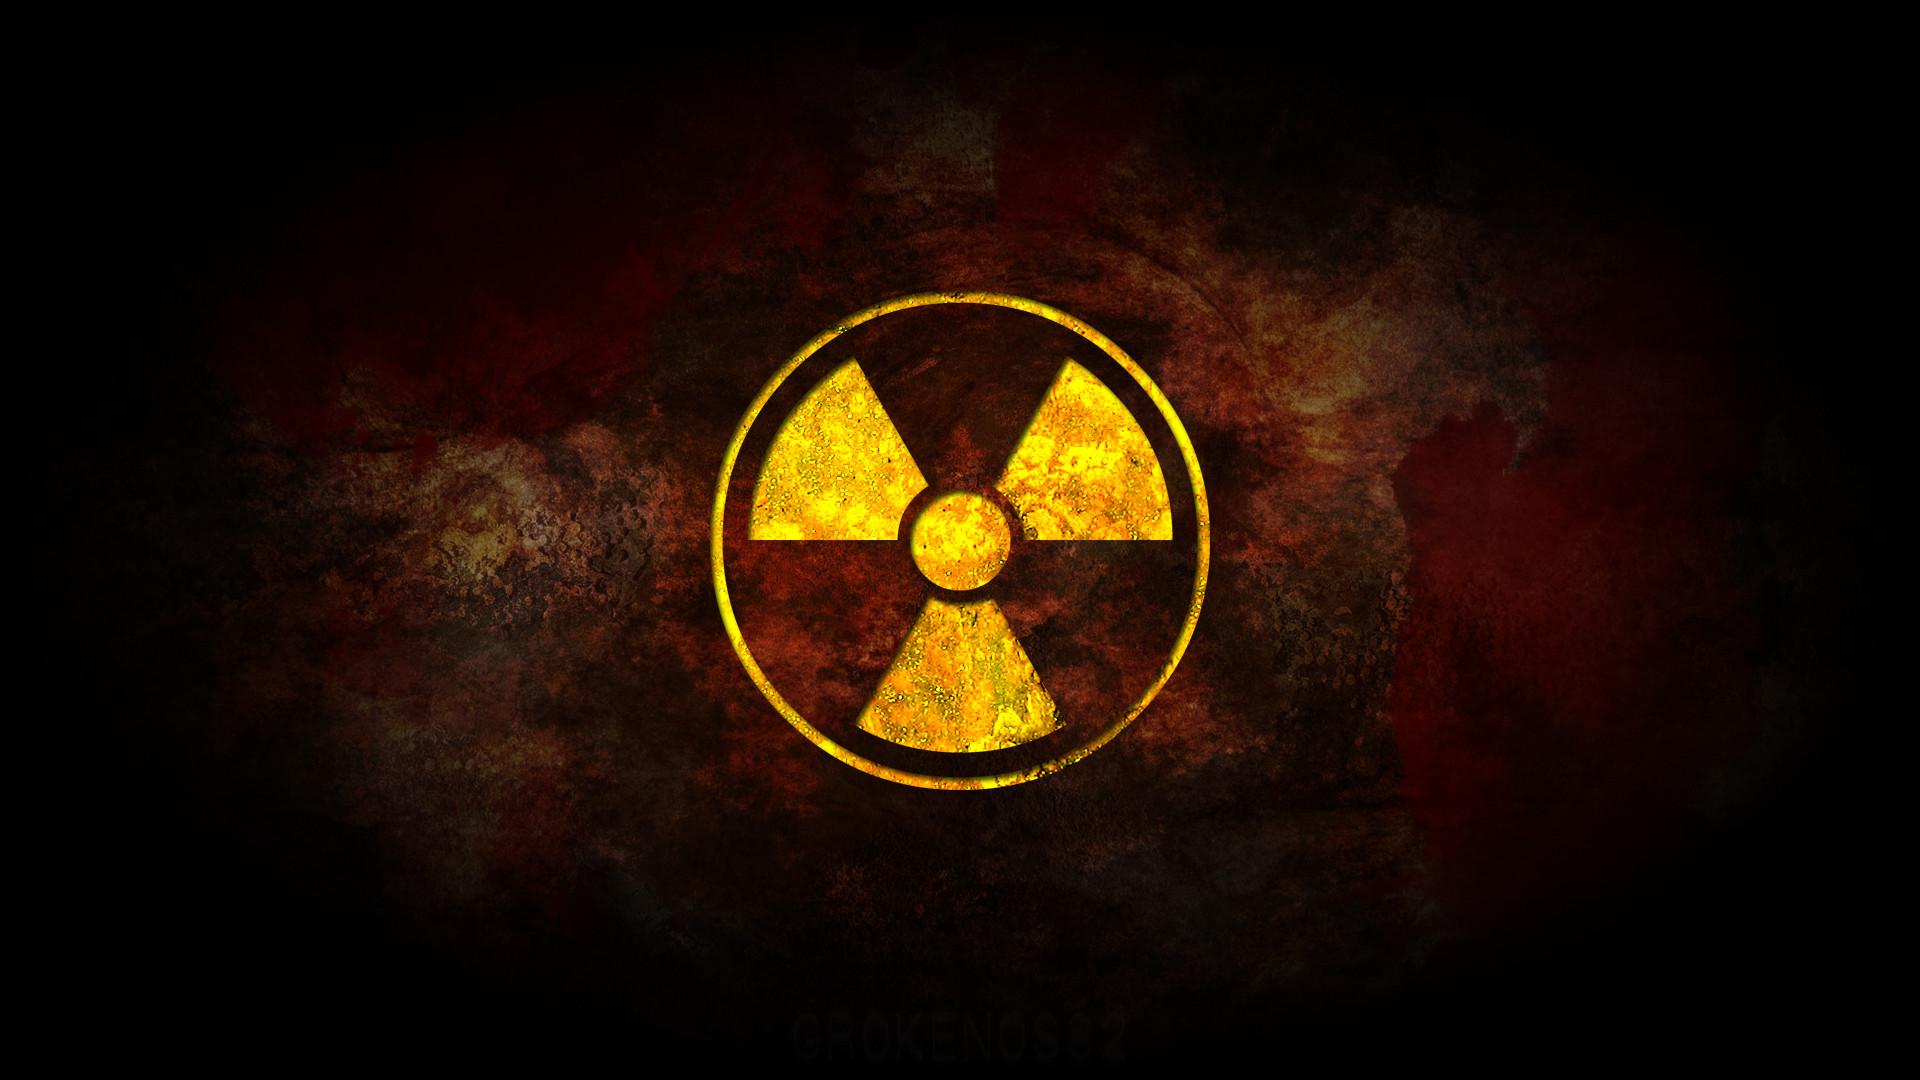 HD Wallpaper Radioactive by Grokenos82 HD Wallpaper Radioactive by  Grokenos82